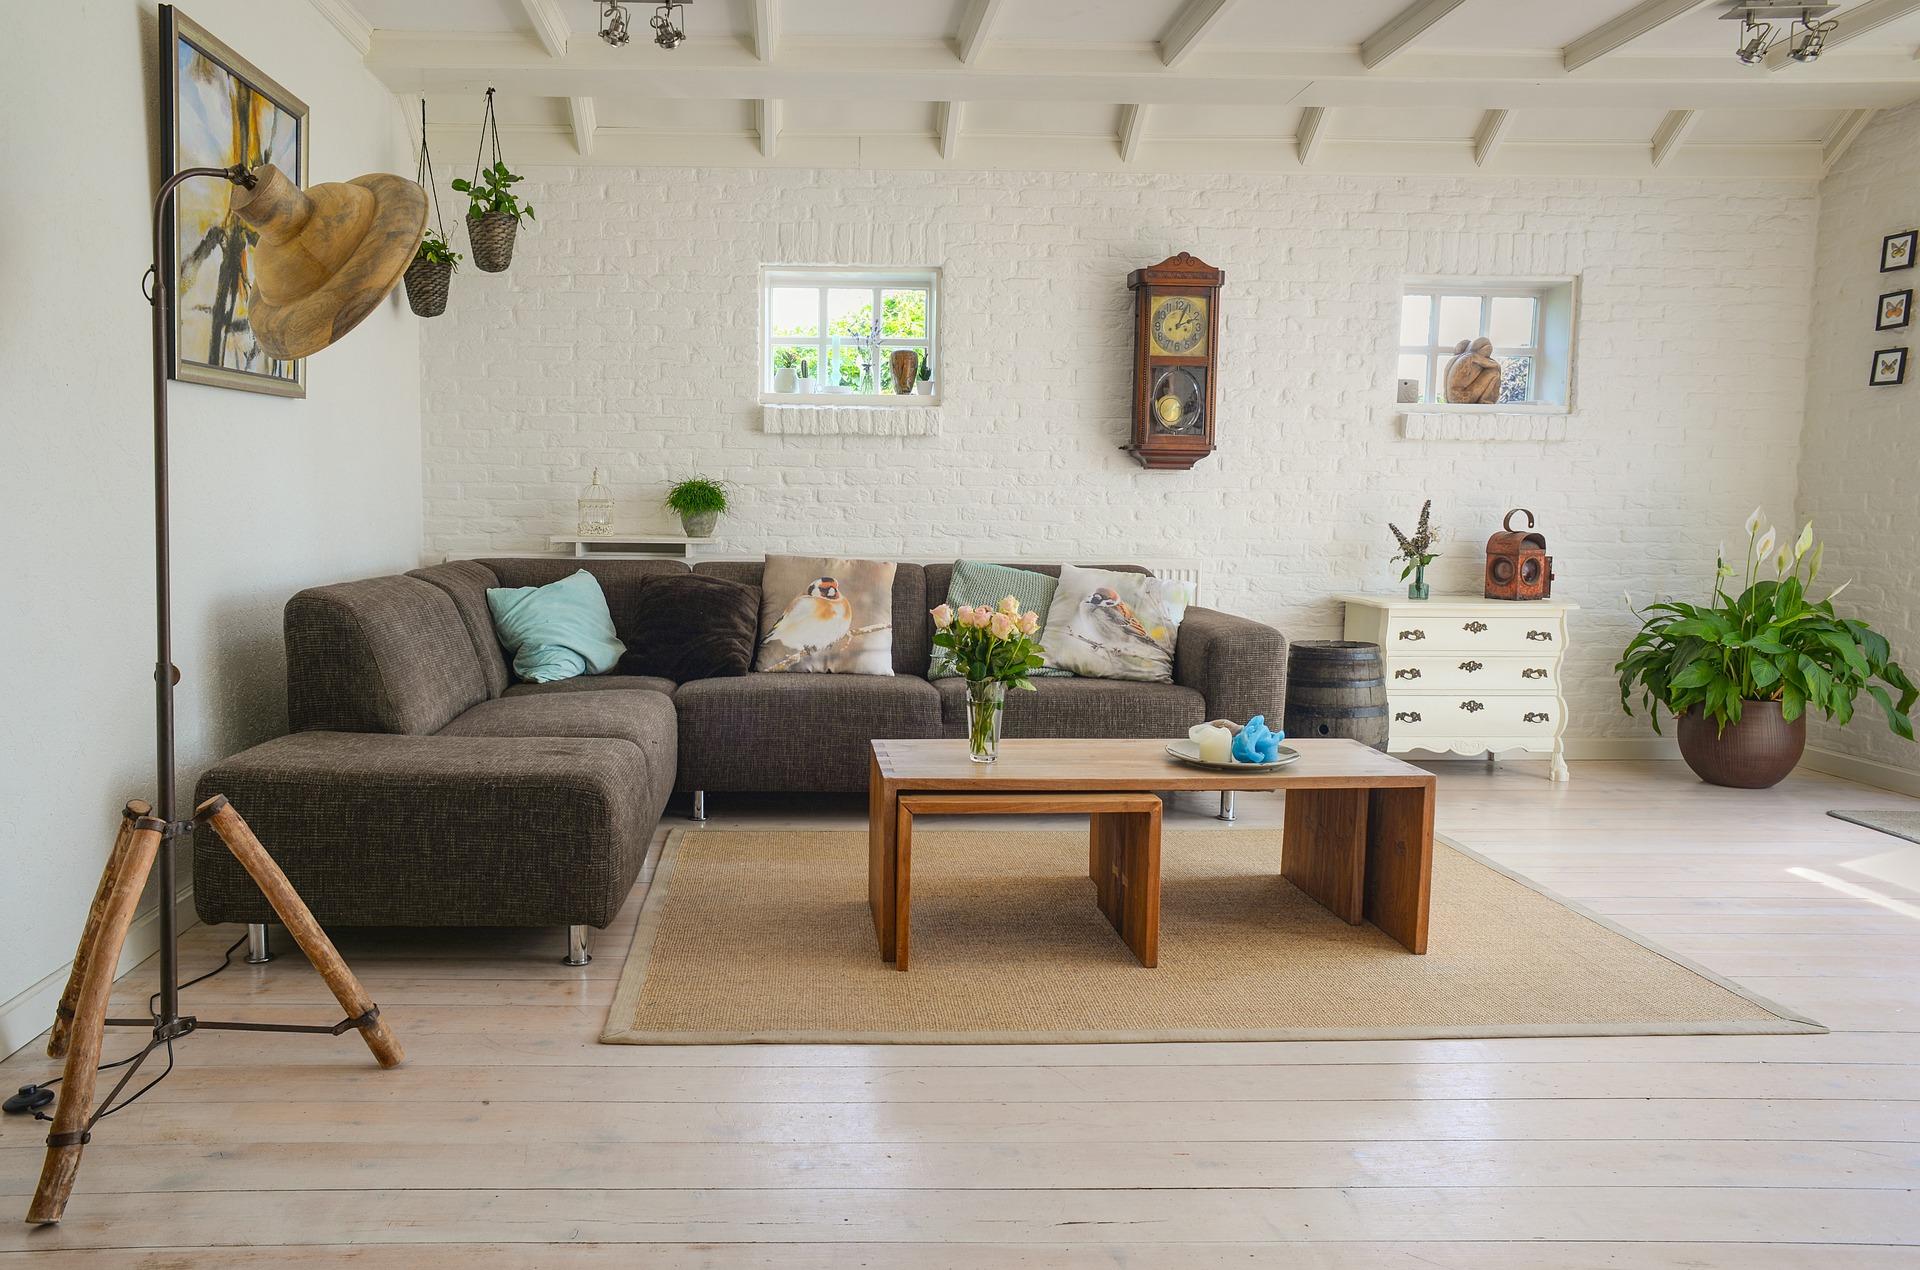 Interior Decorators & Designers - Workroom